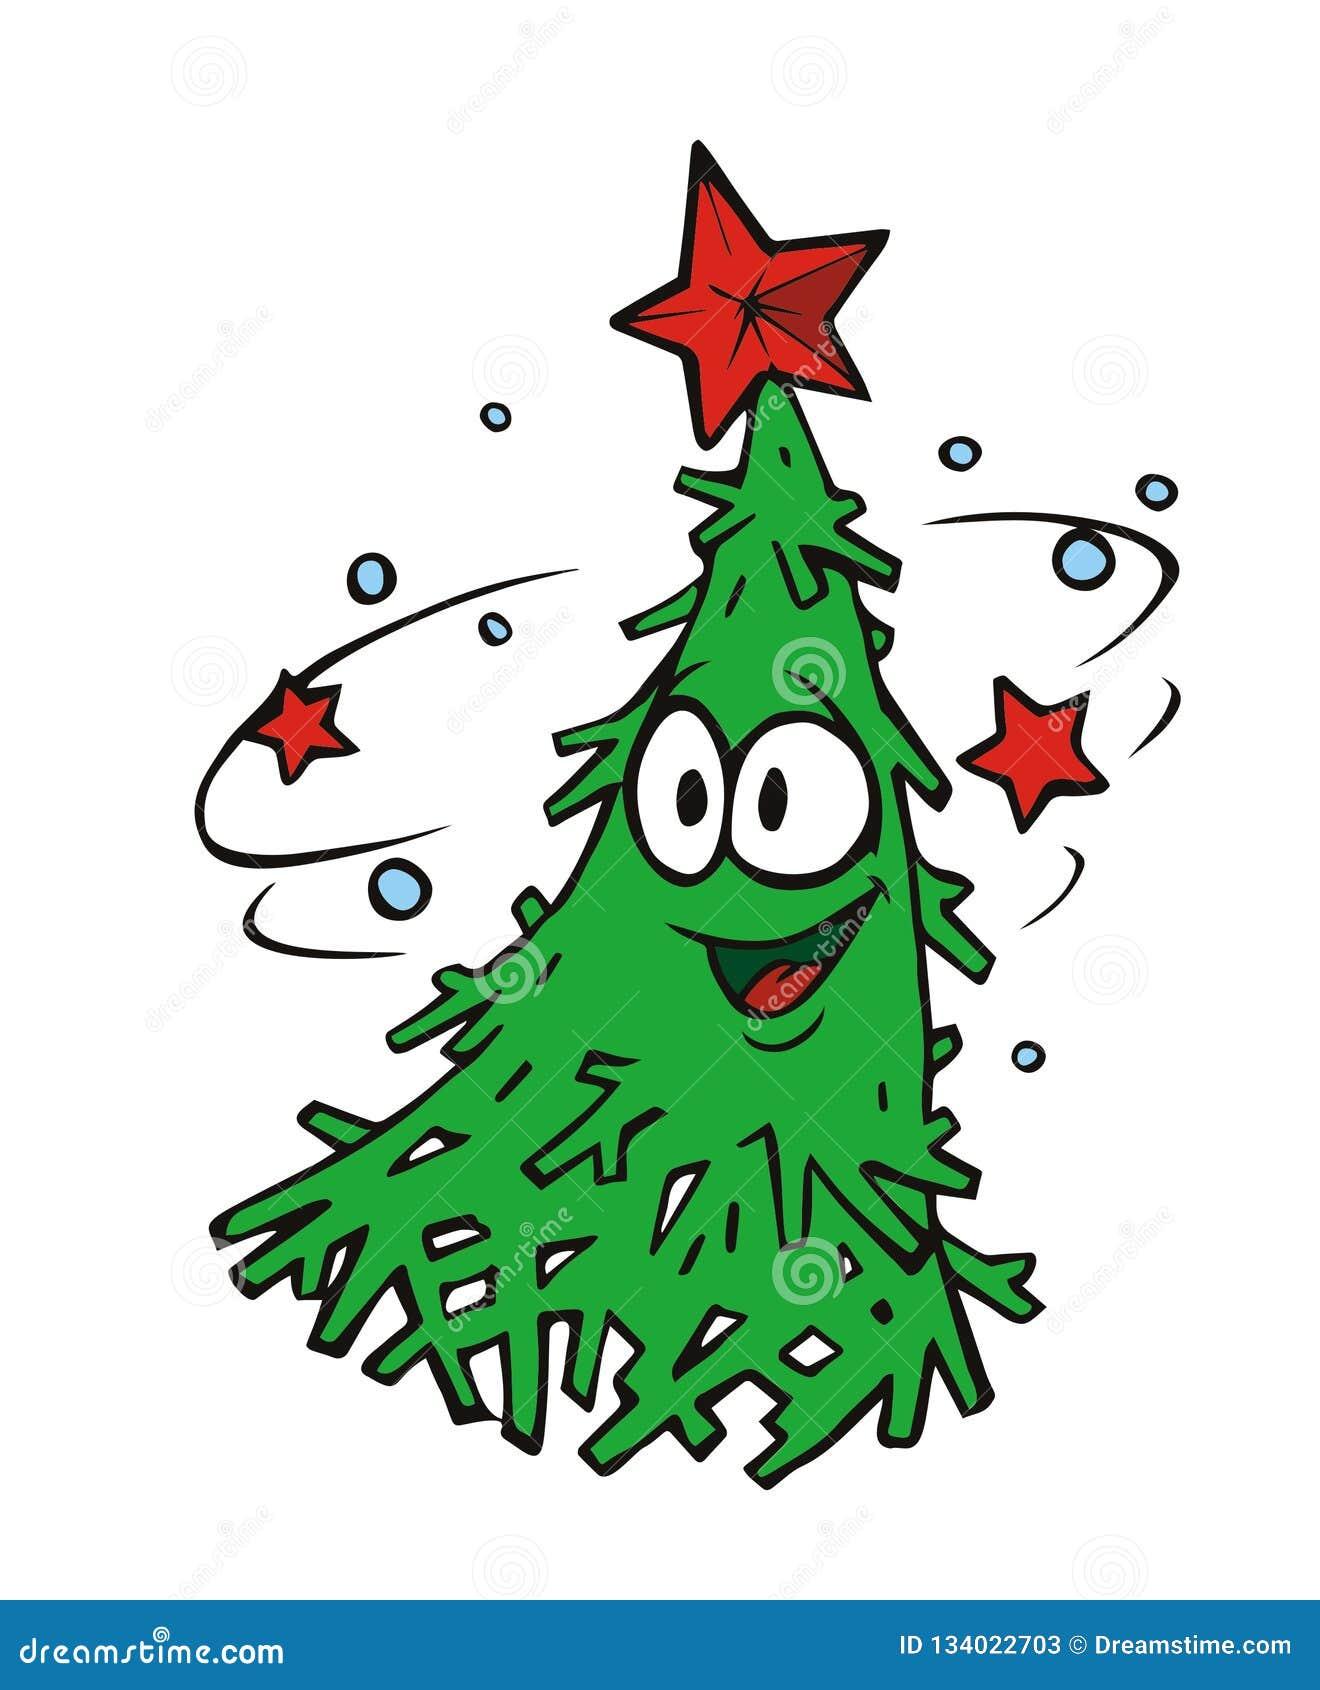 Character Merry Dancing Christmas Tree Stock Vector ...